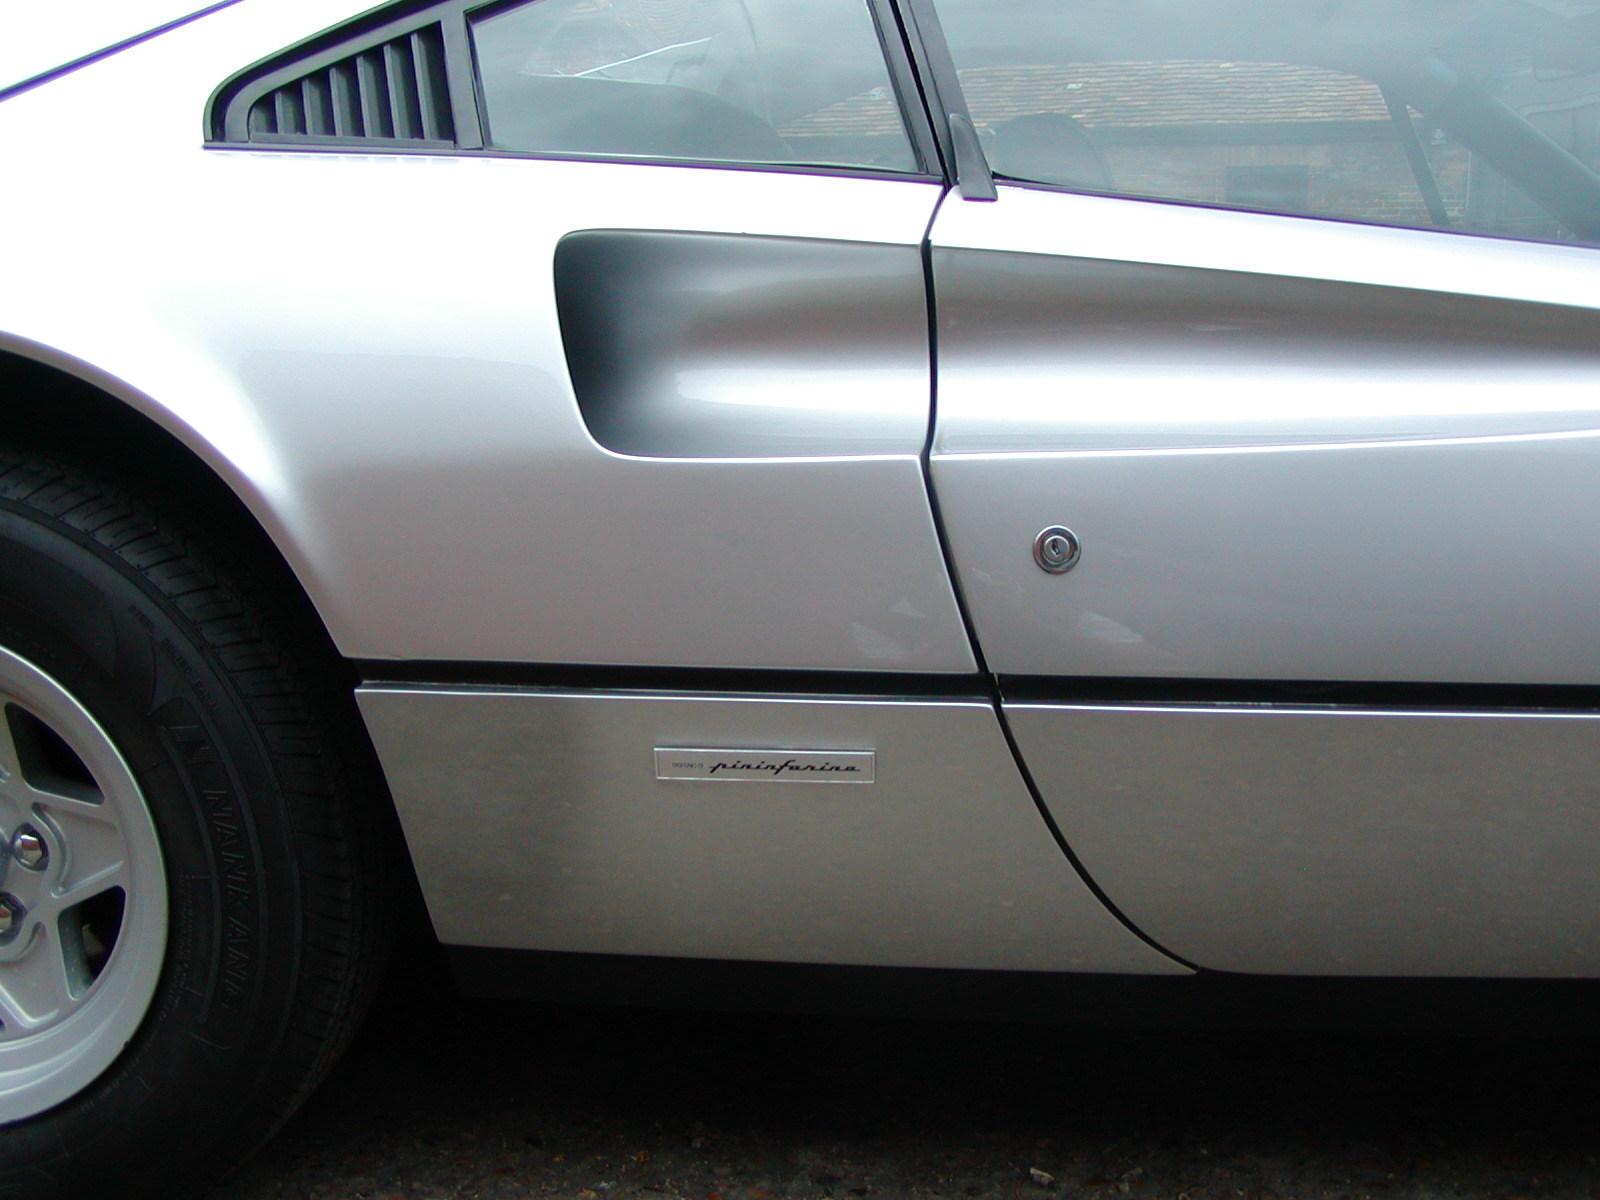 small Ferrari の造形の変化_a0129711_09275226.jpg